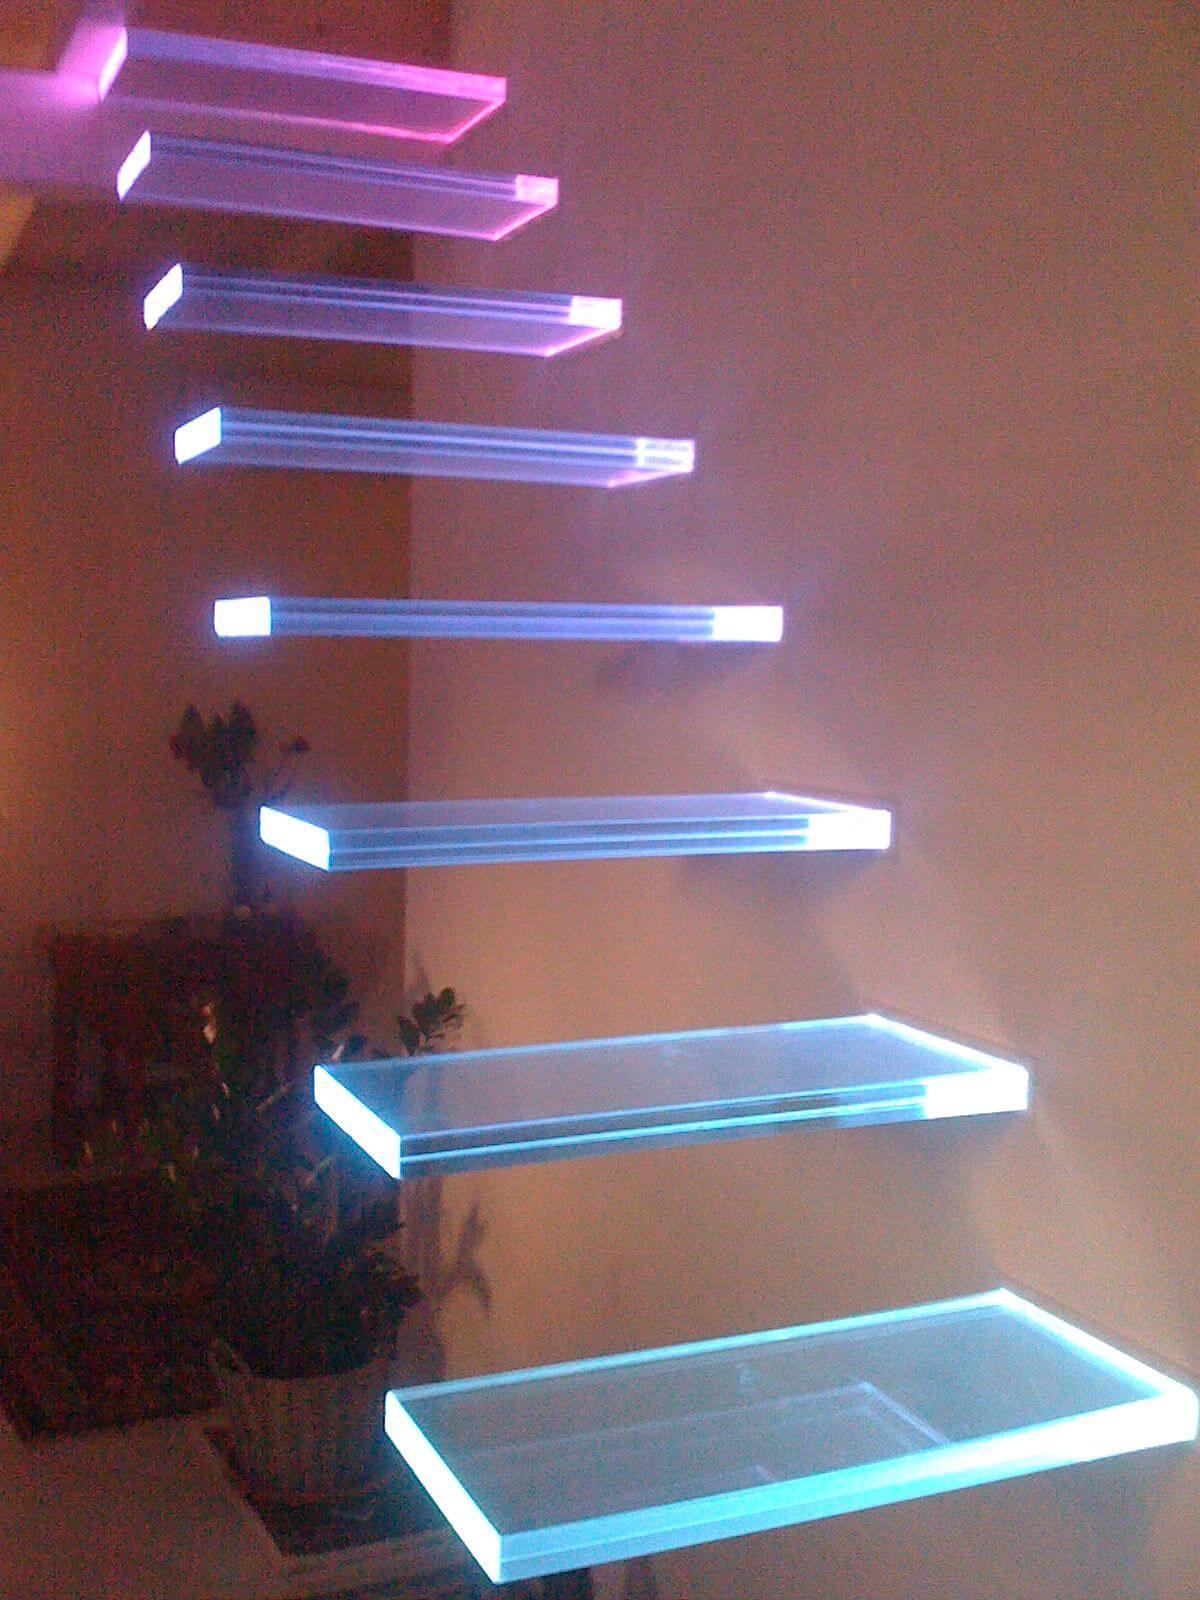 cam-merdiven-modeli-6